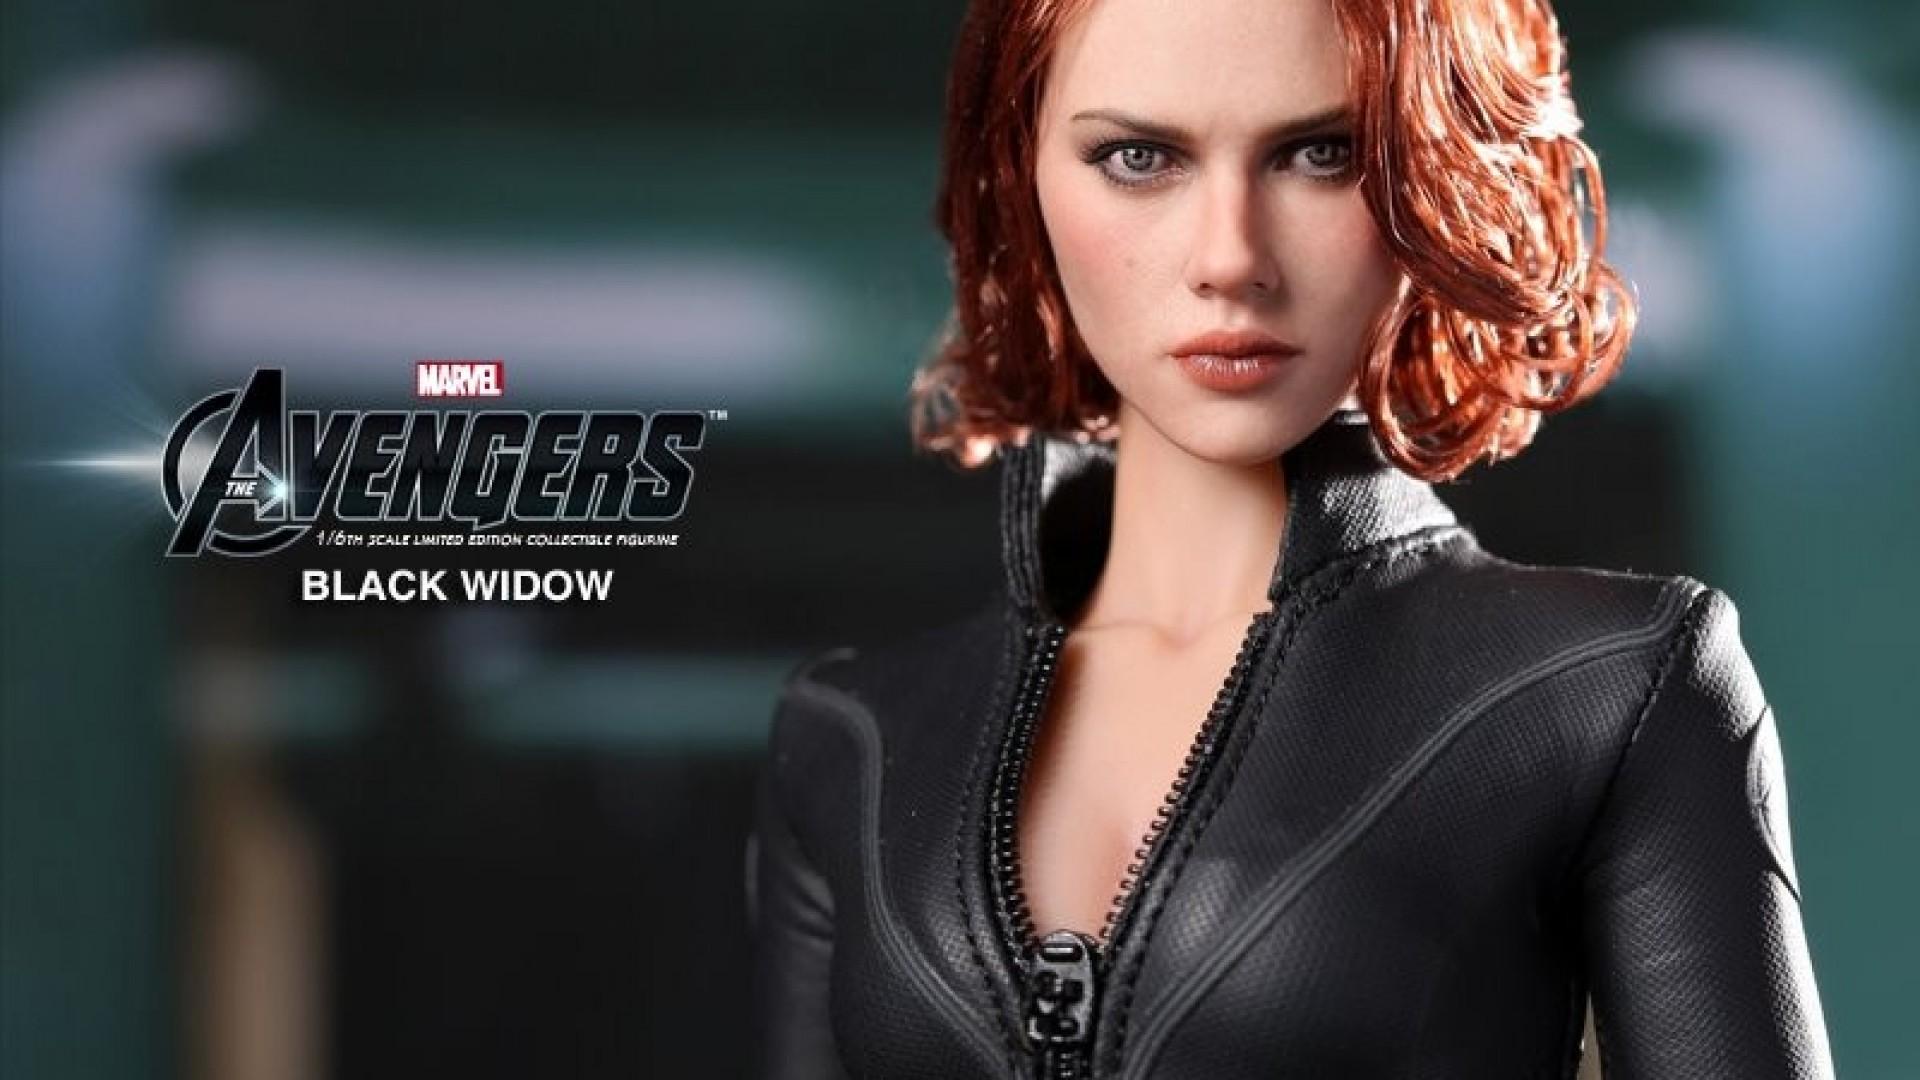 Black Widow Avengers Figurines Wallpaper   MixHD wallpapers 1920x1080